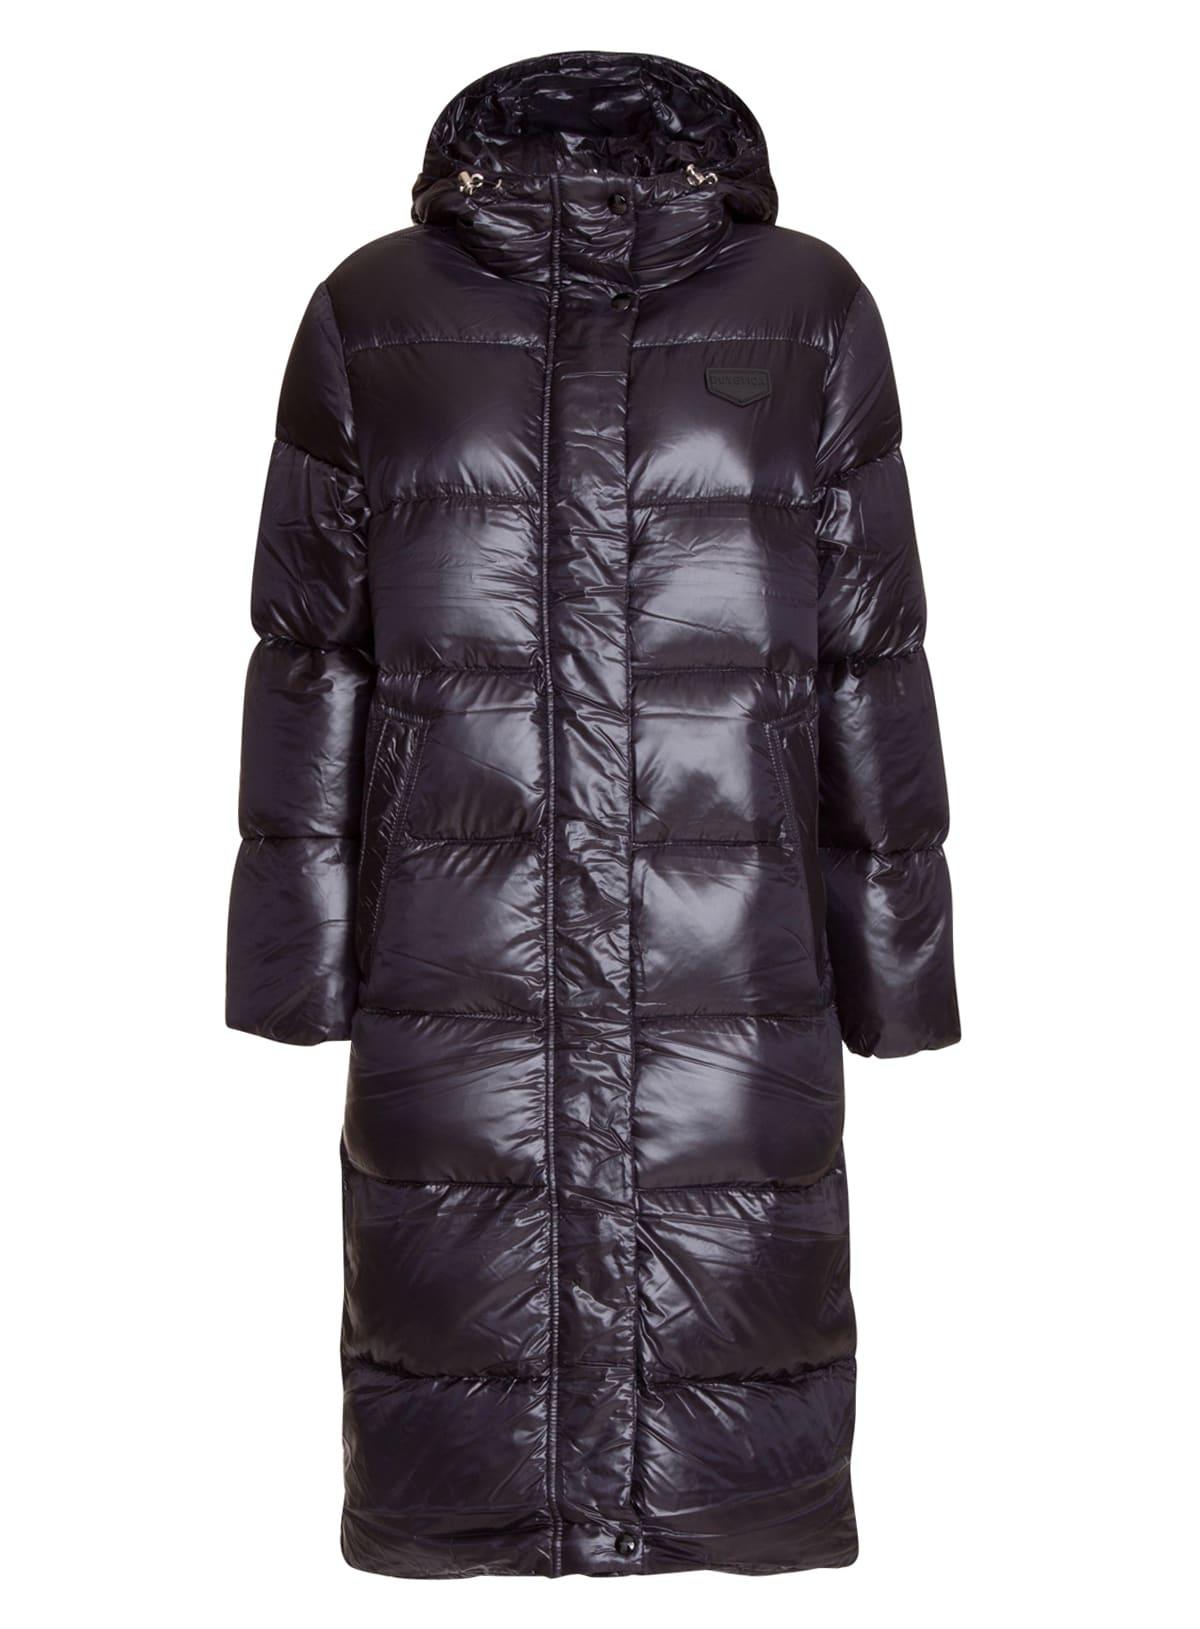 Duvetica Long Padded Coat